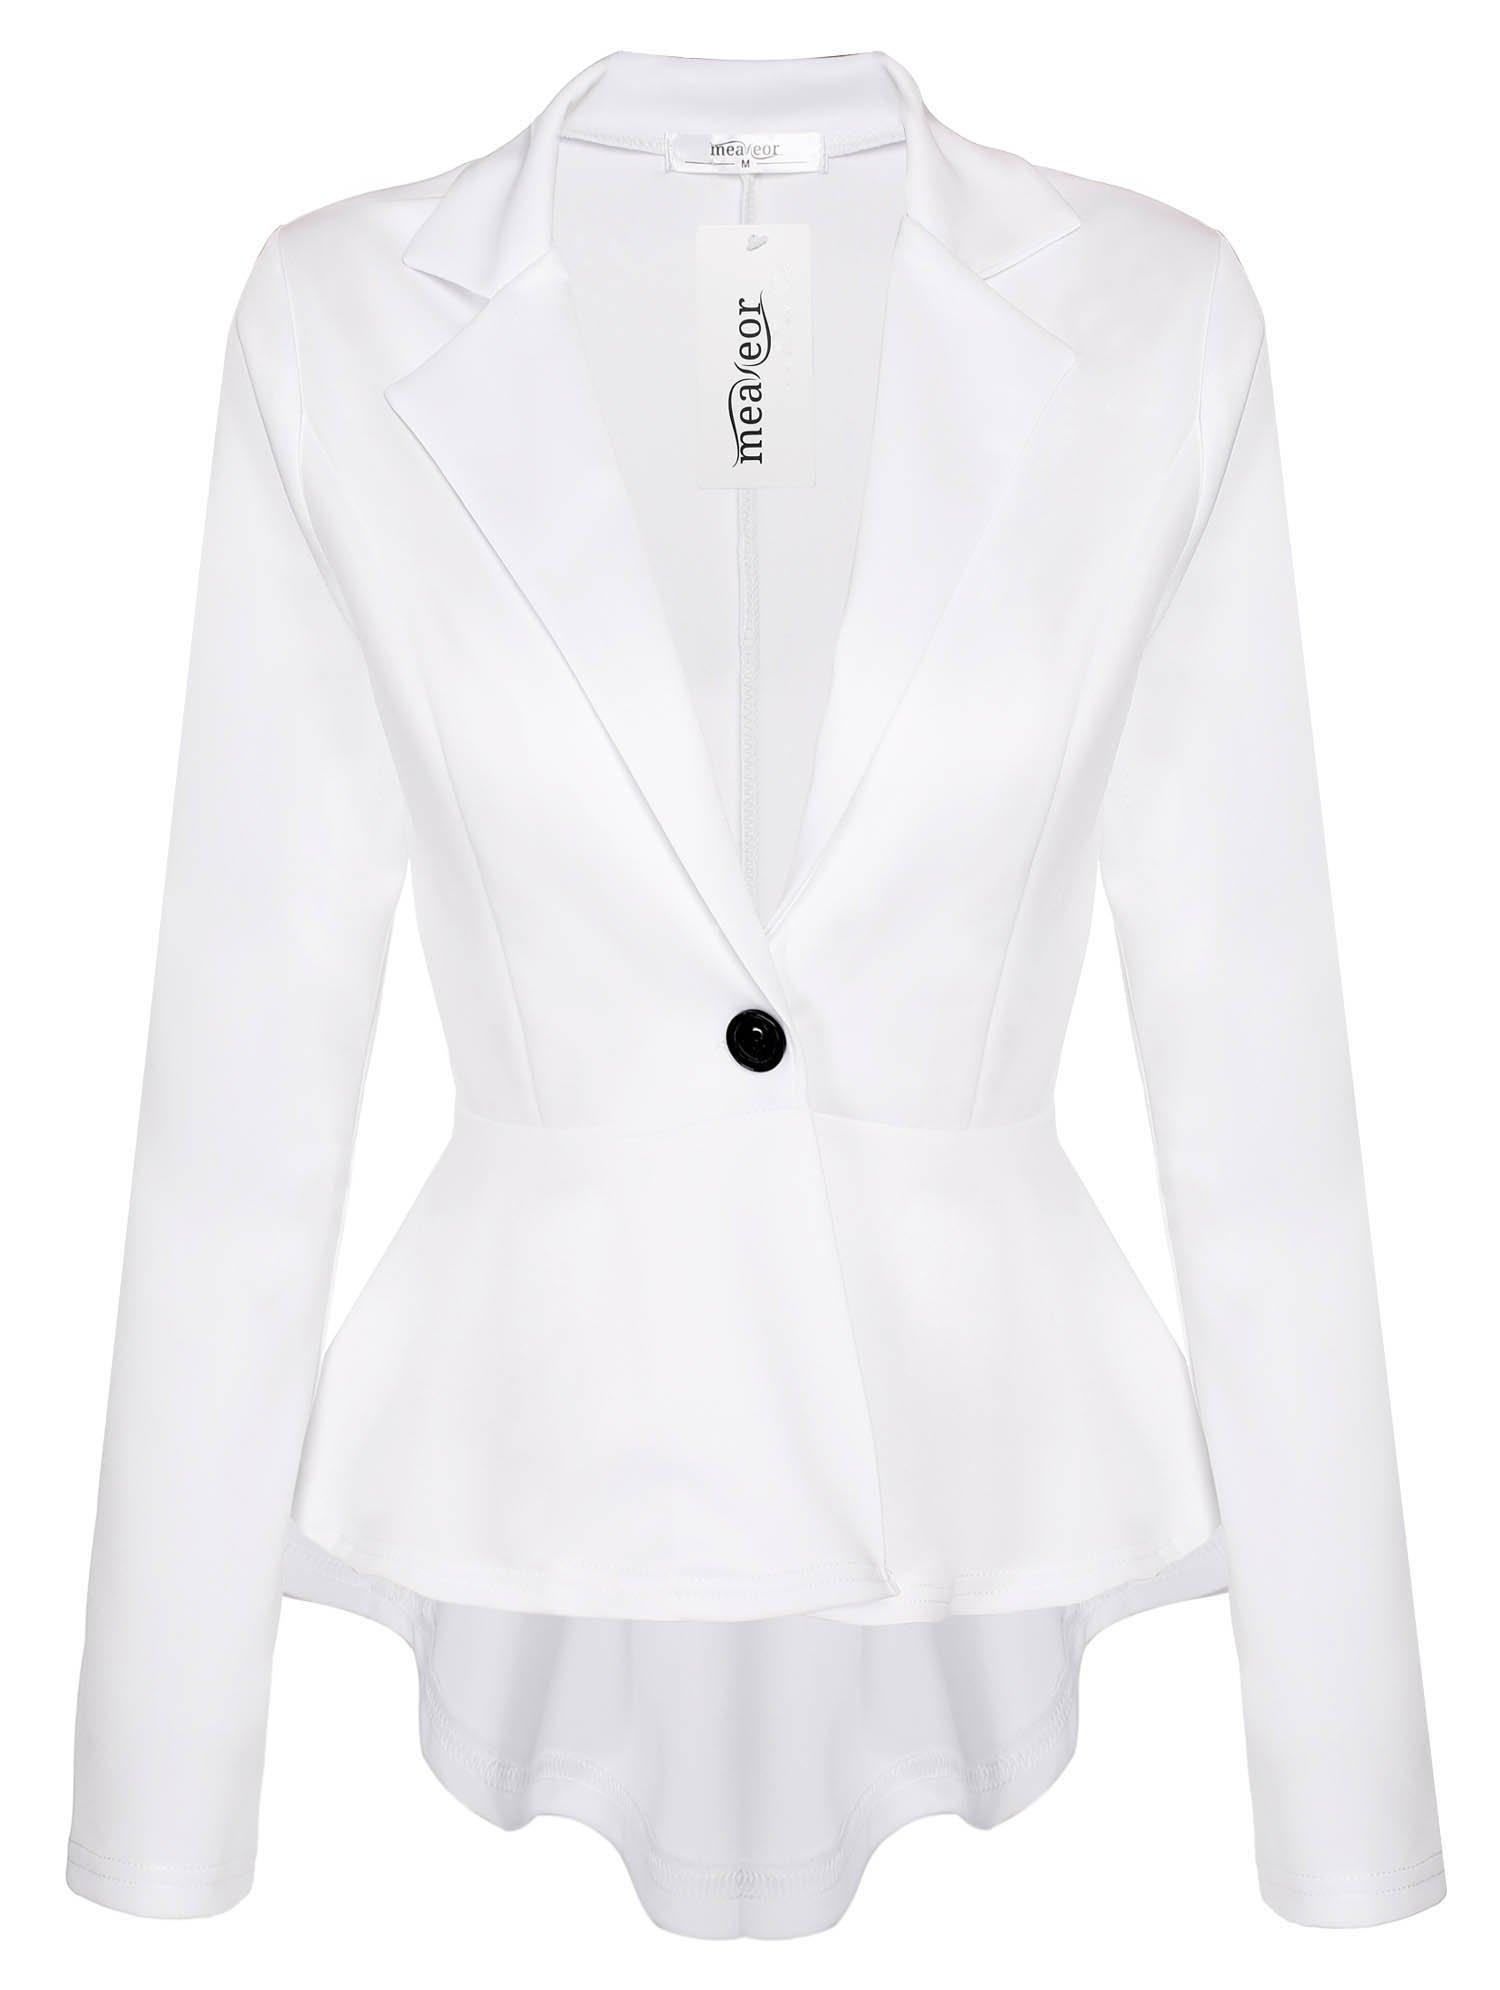 Meaneor Women's Crop Frill Shift Slim Fit Peplum Blazer Jacket Plus Size Coat White XL by Meaneor (Image #1)